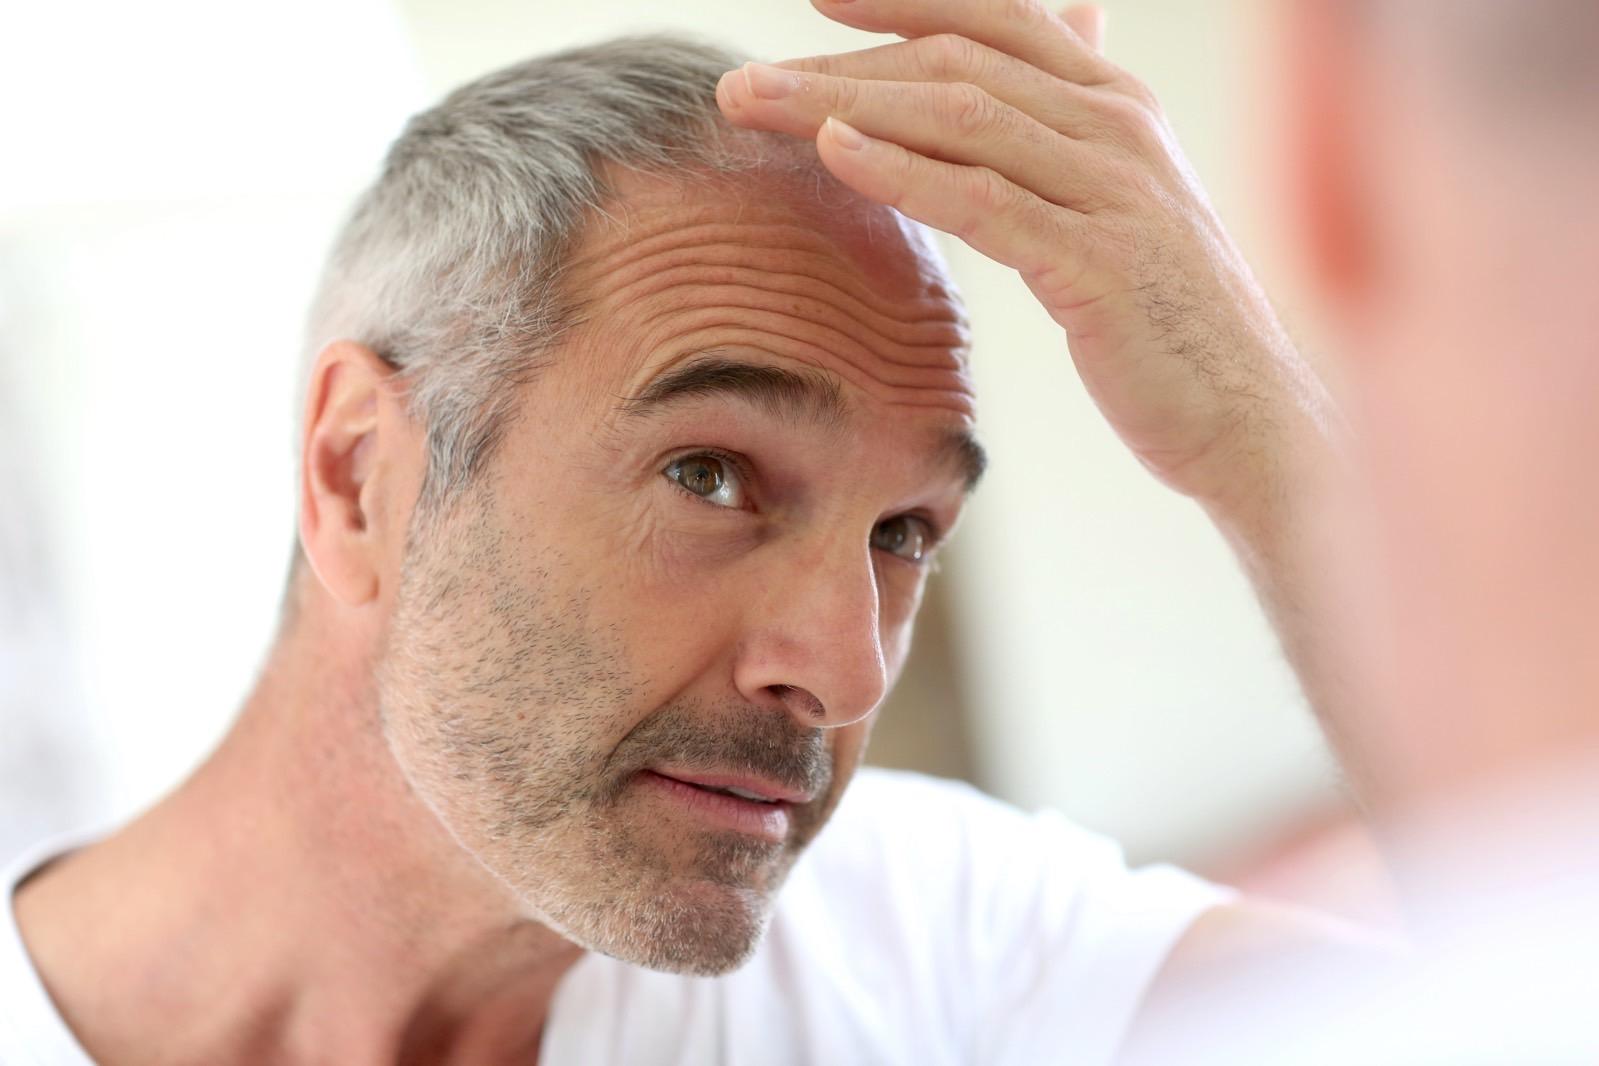 Para peneliti baru saja membuktikan stres membuat rambut beruban